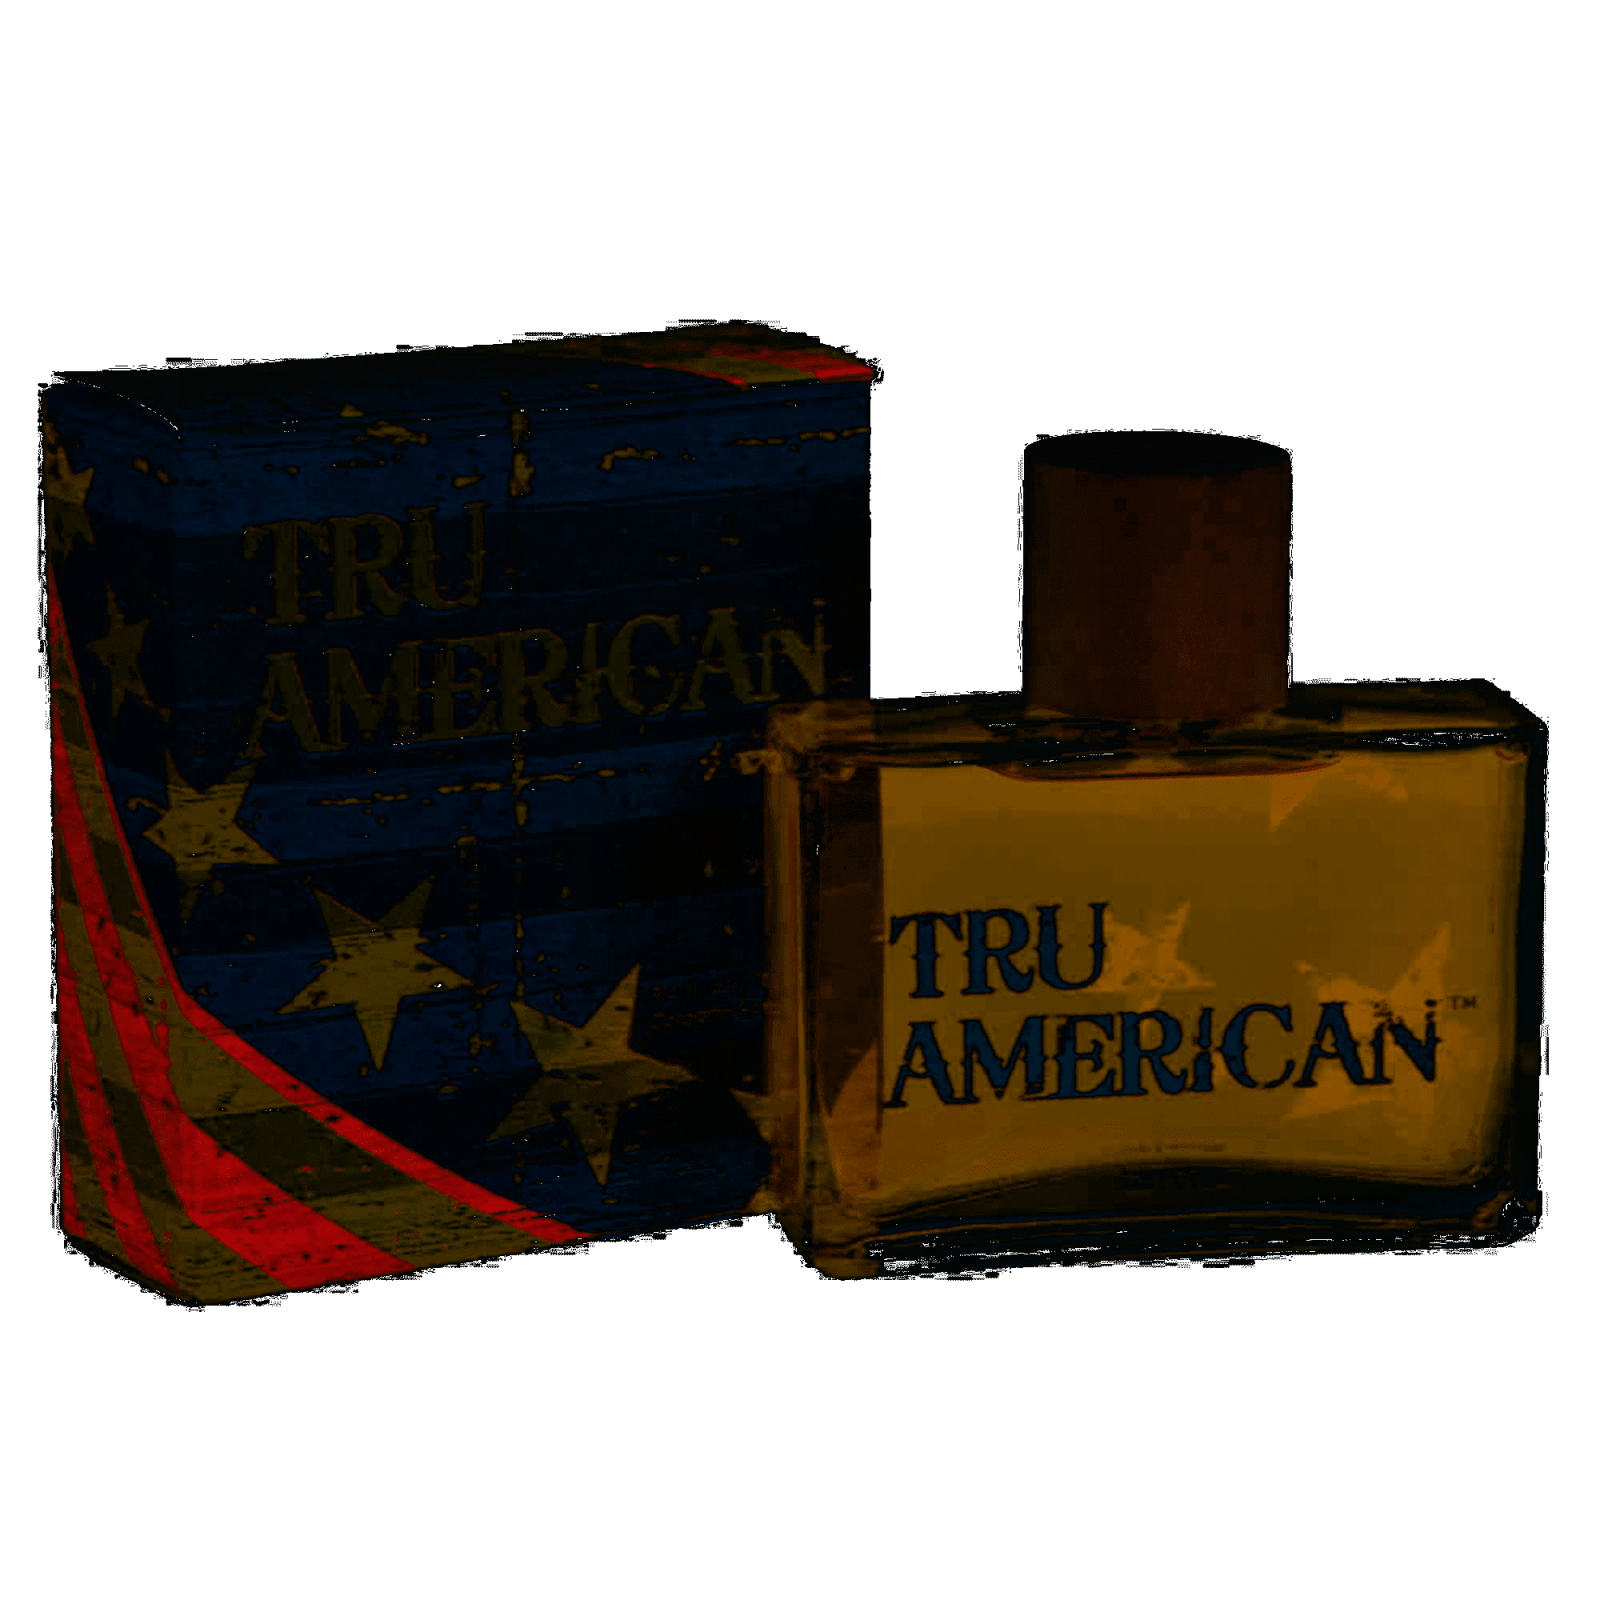 Tru American Colonge